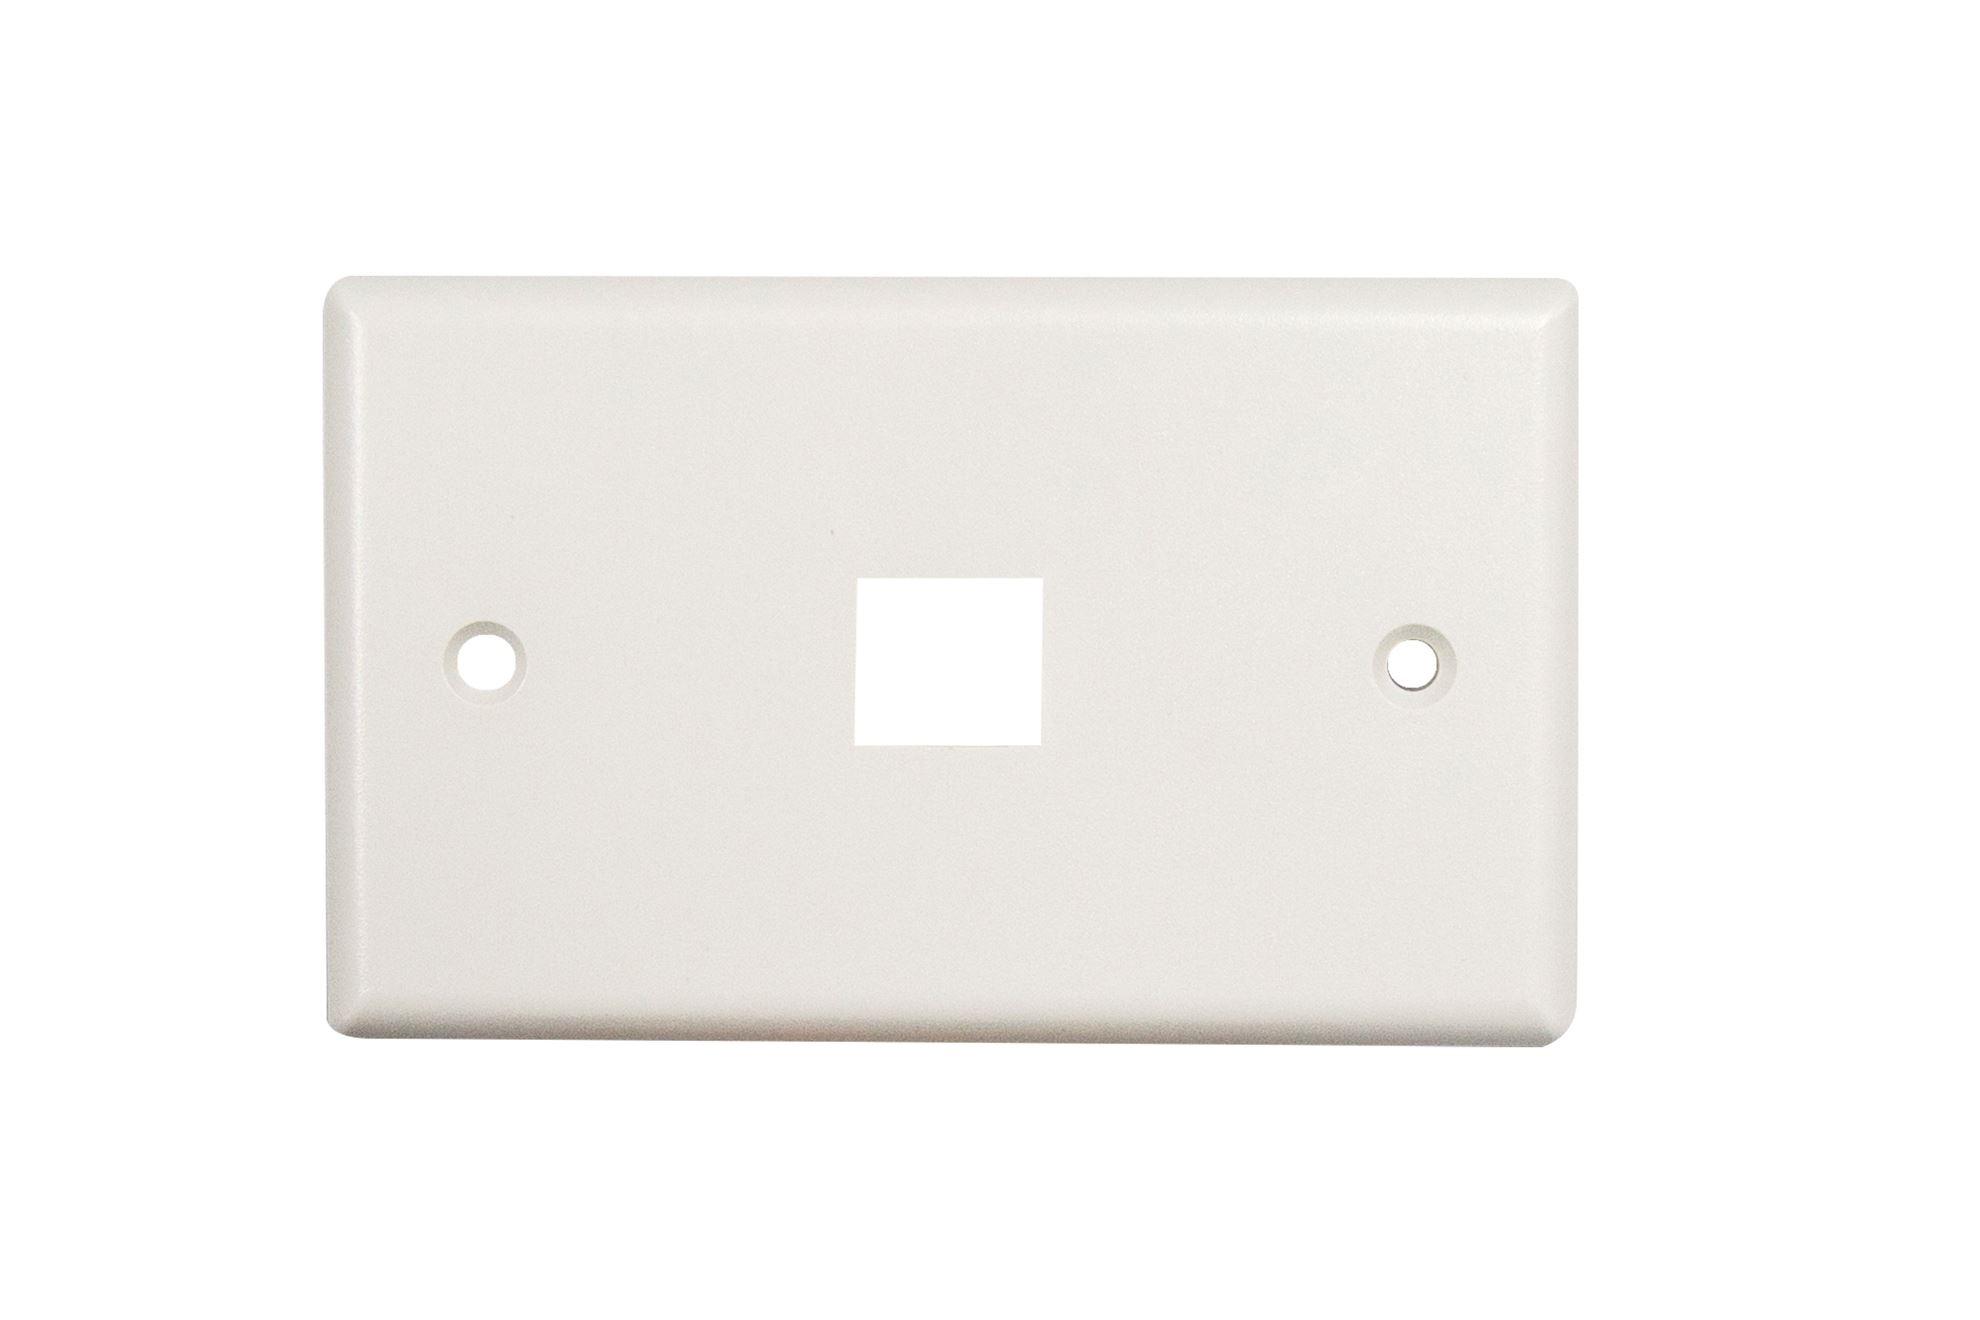 DYNAMIX Single Port Face Plate for 110/Keystone Jacks